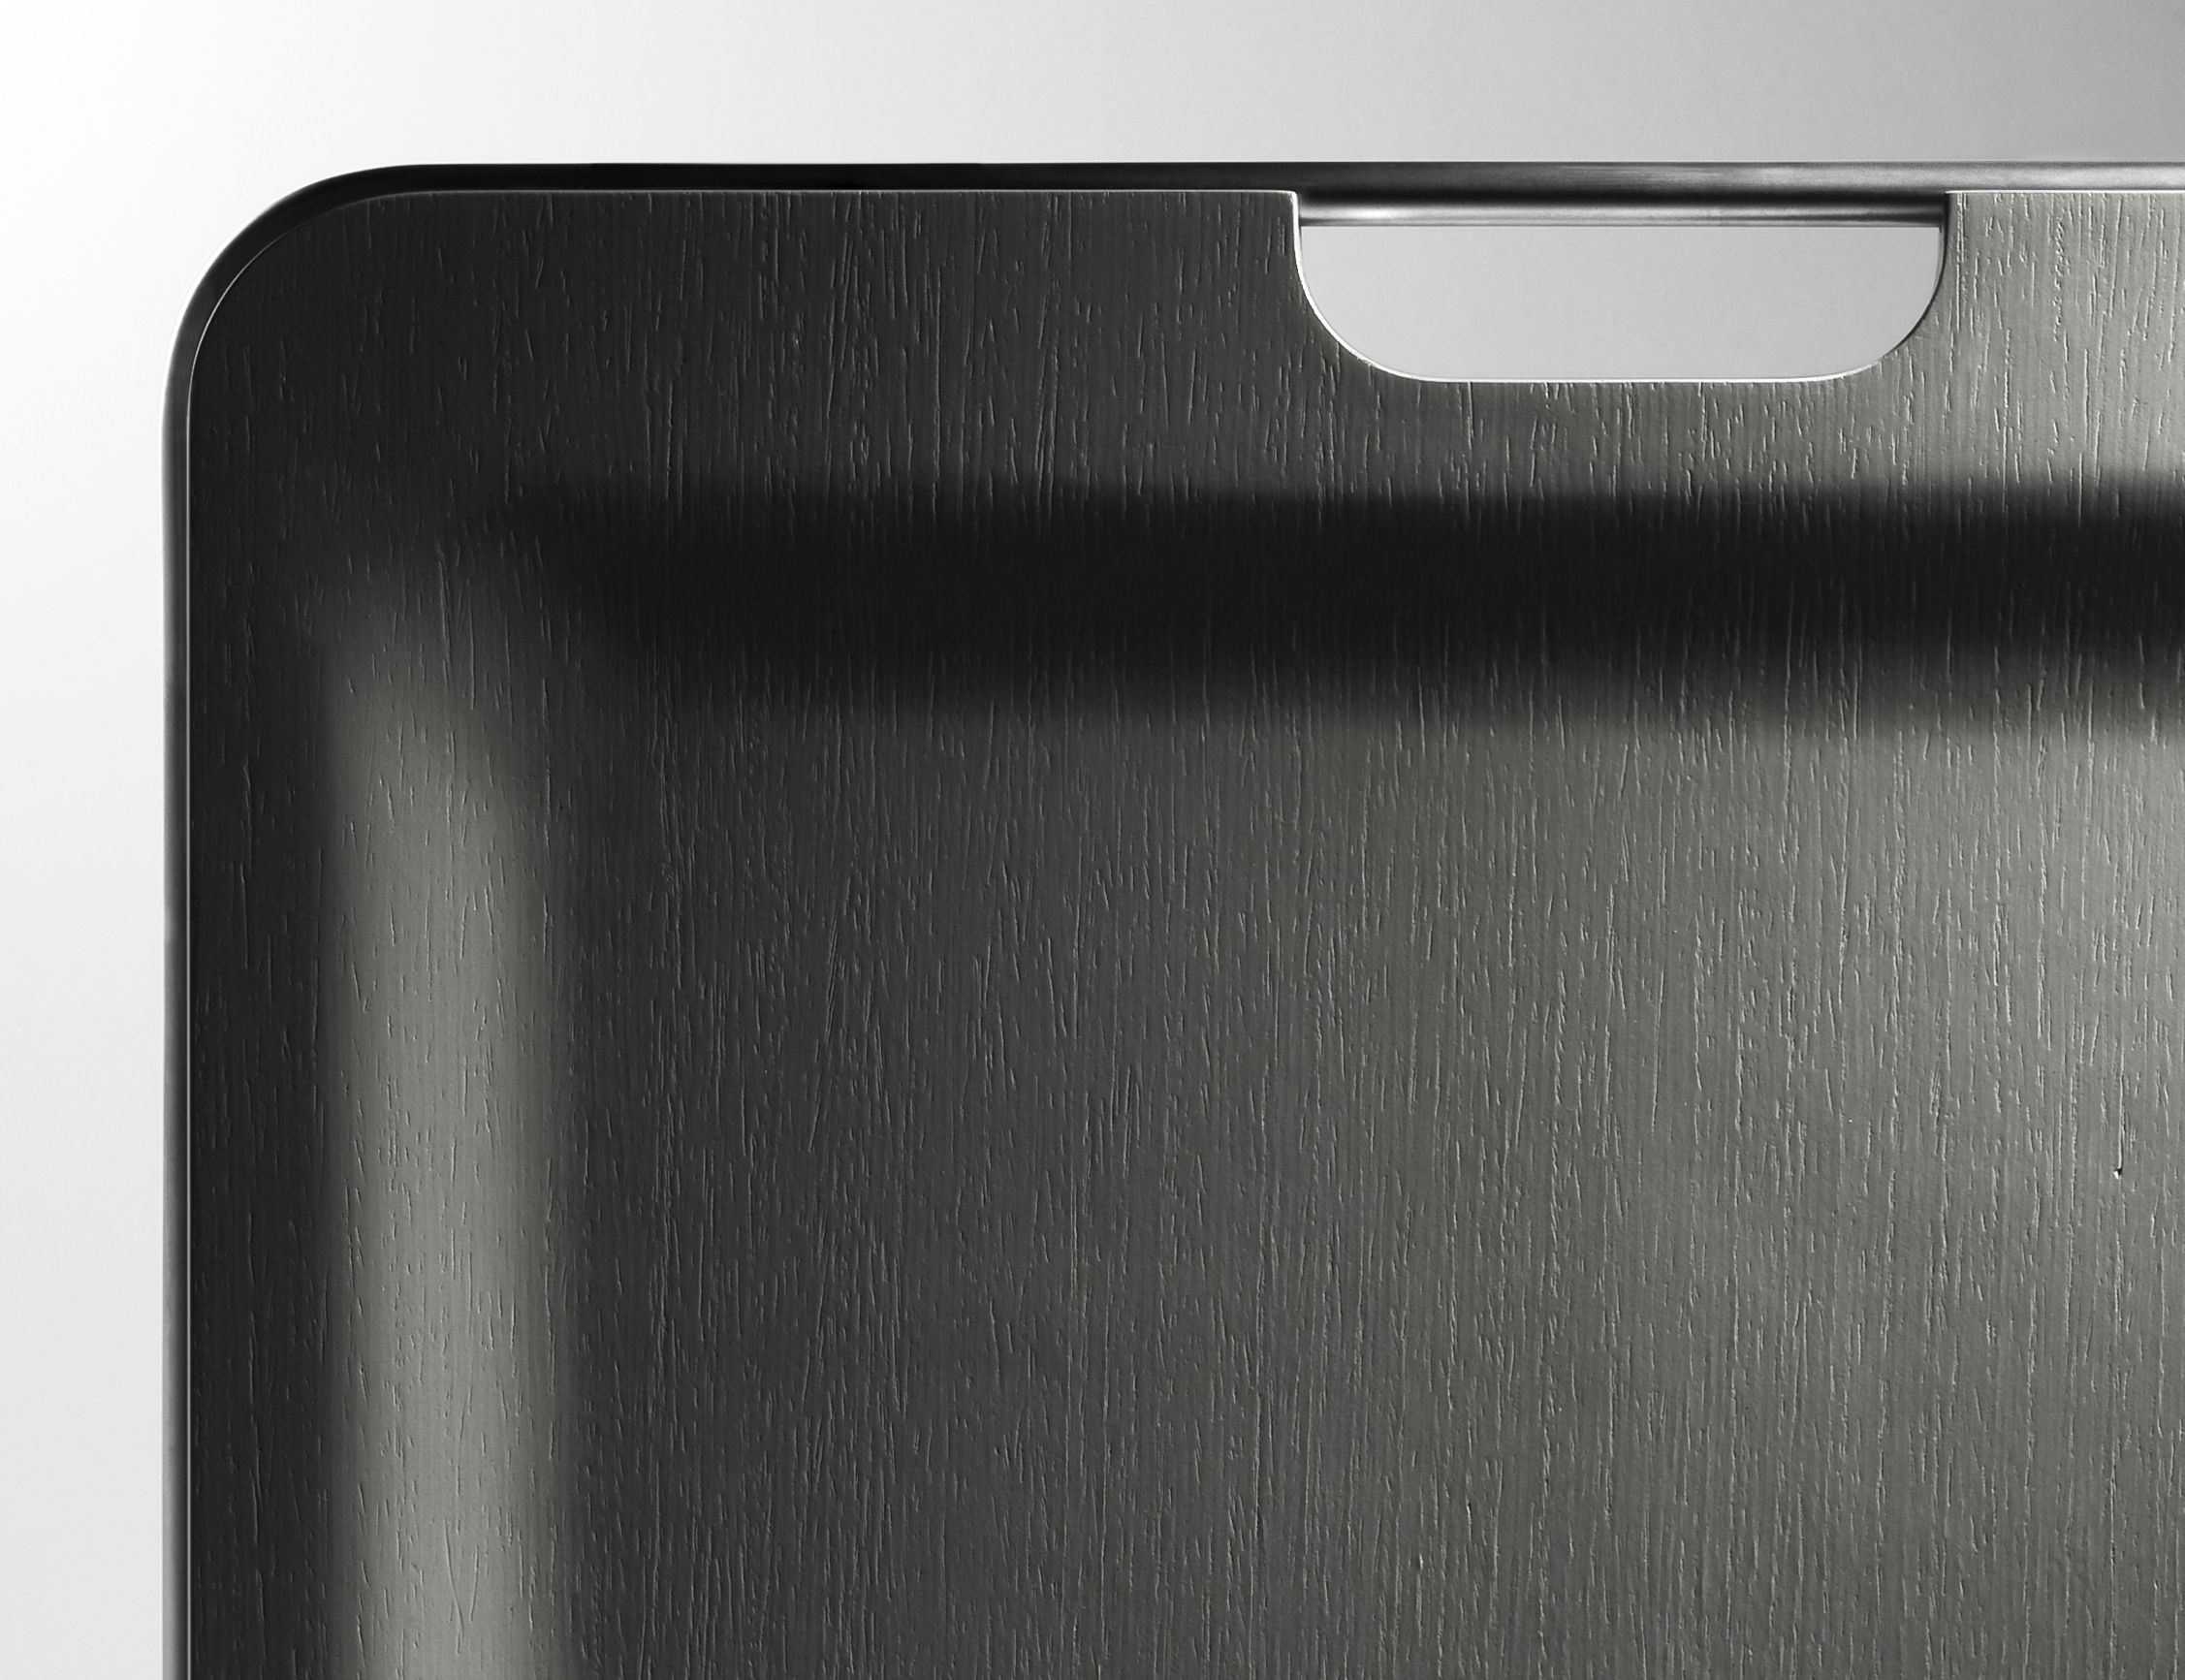 radiateur bag infrarouge et mobile ch ne teint gris i radium. Black Bedroom Furniture Sets. Home Design Ideas